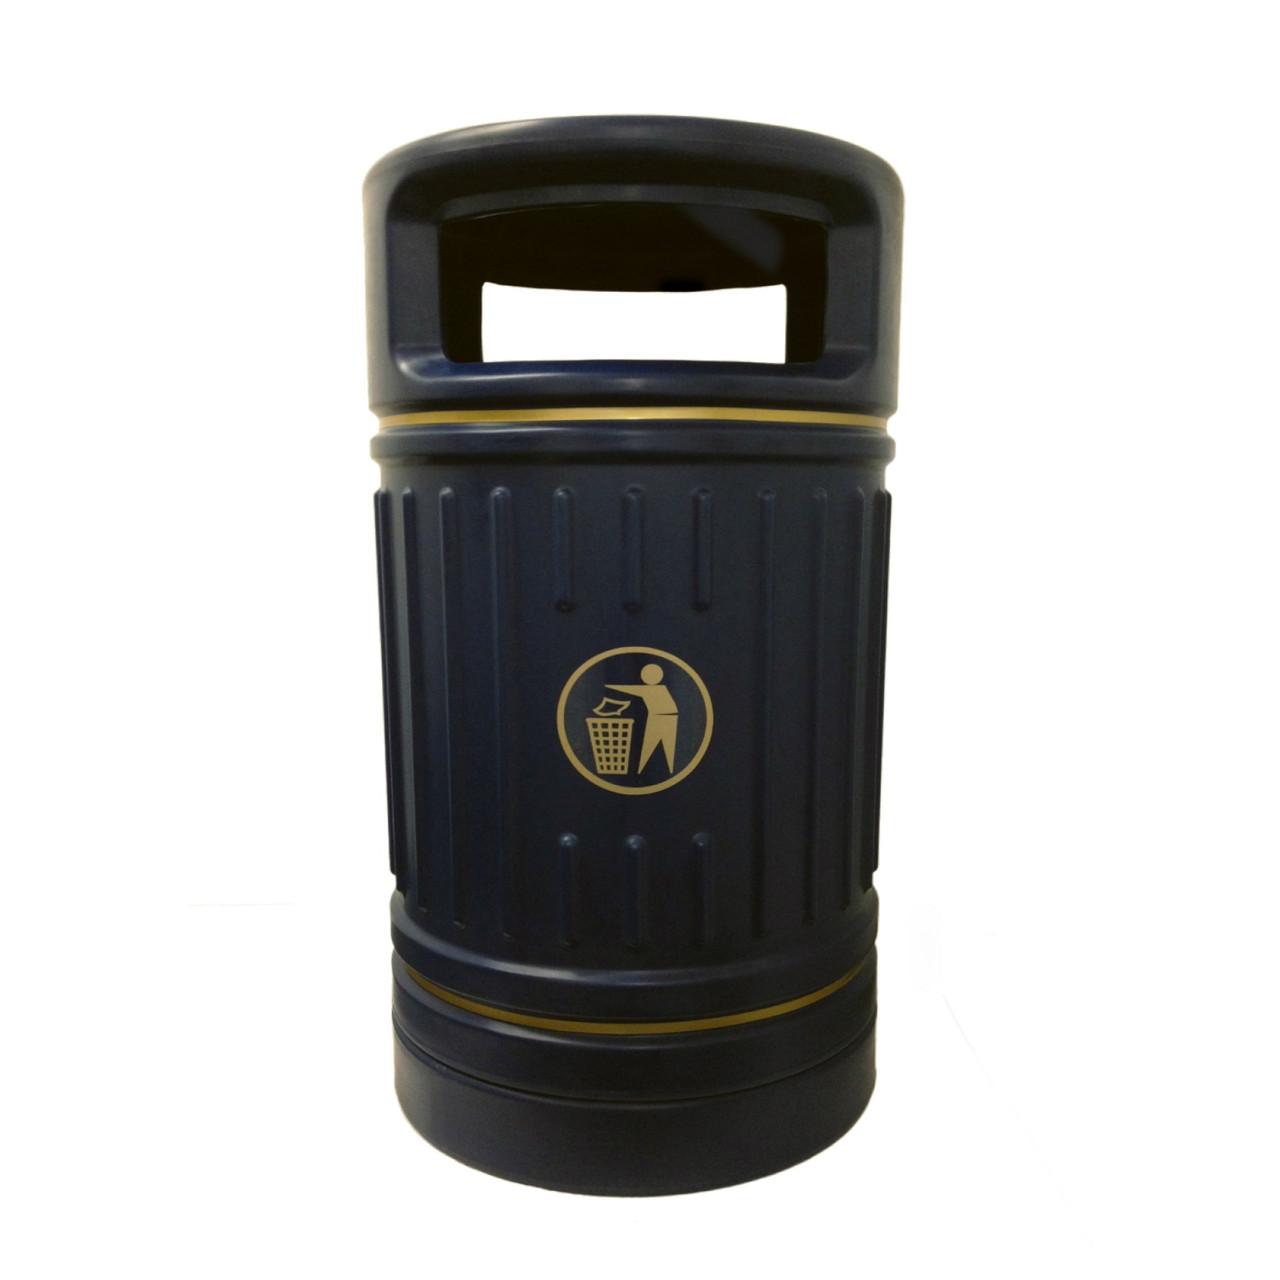 Black Centurion 100 Litre plastic heritage litter bin